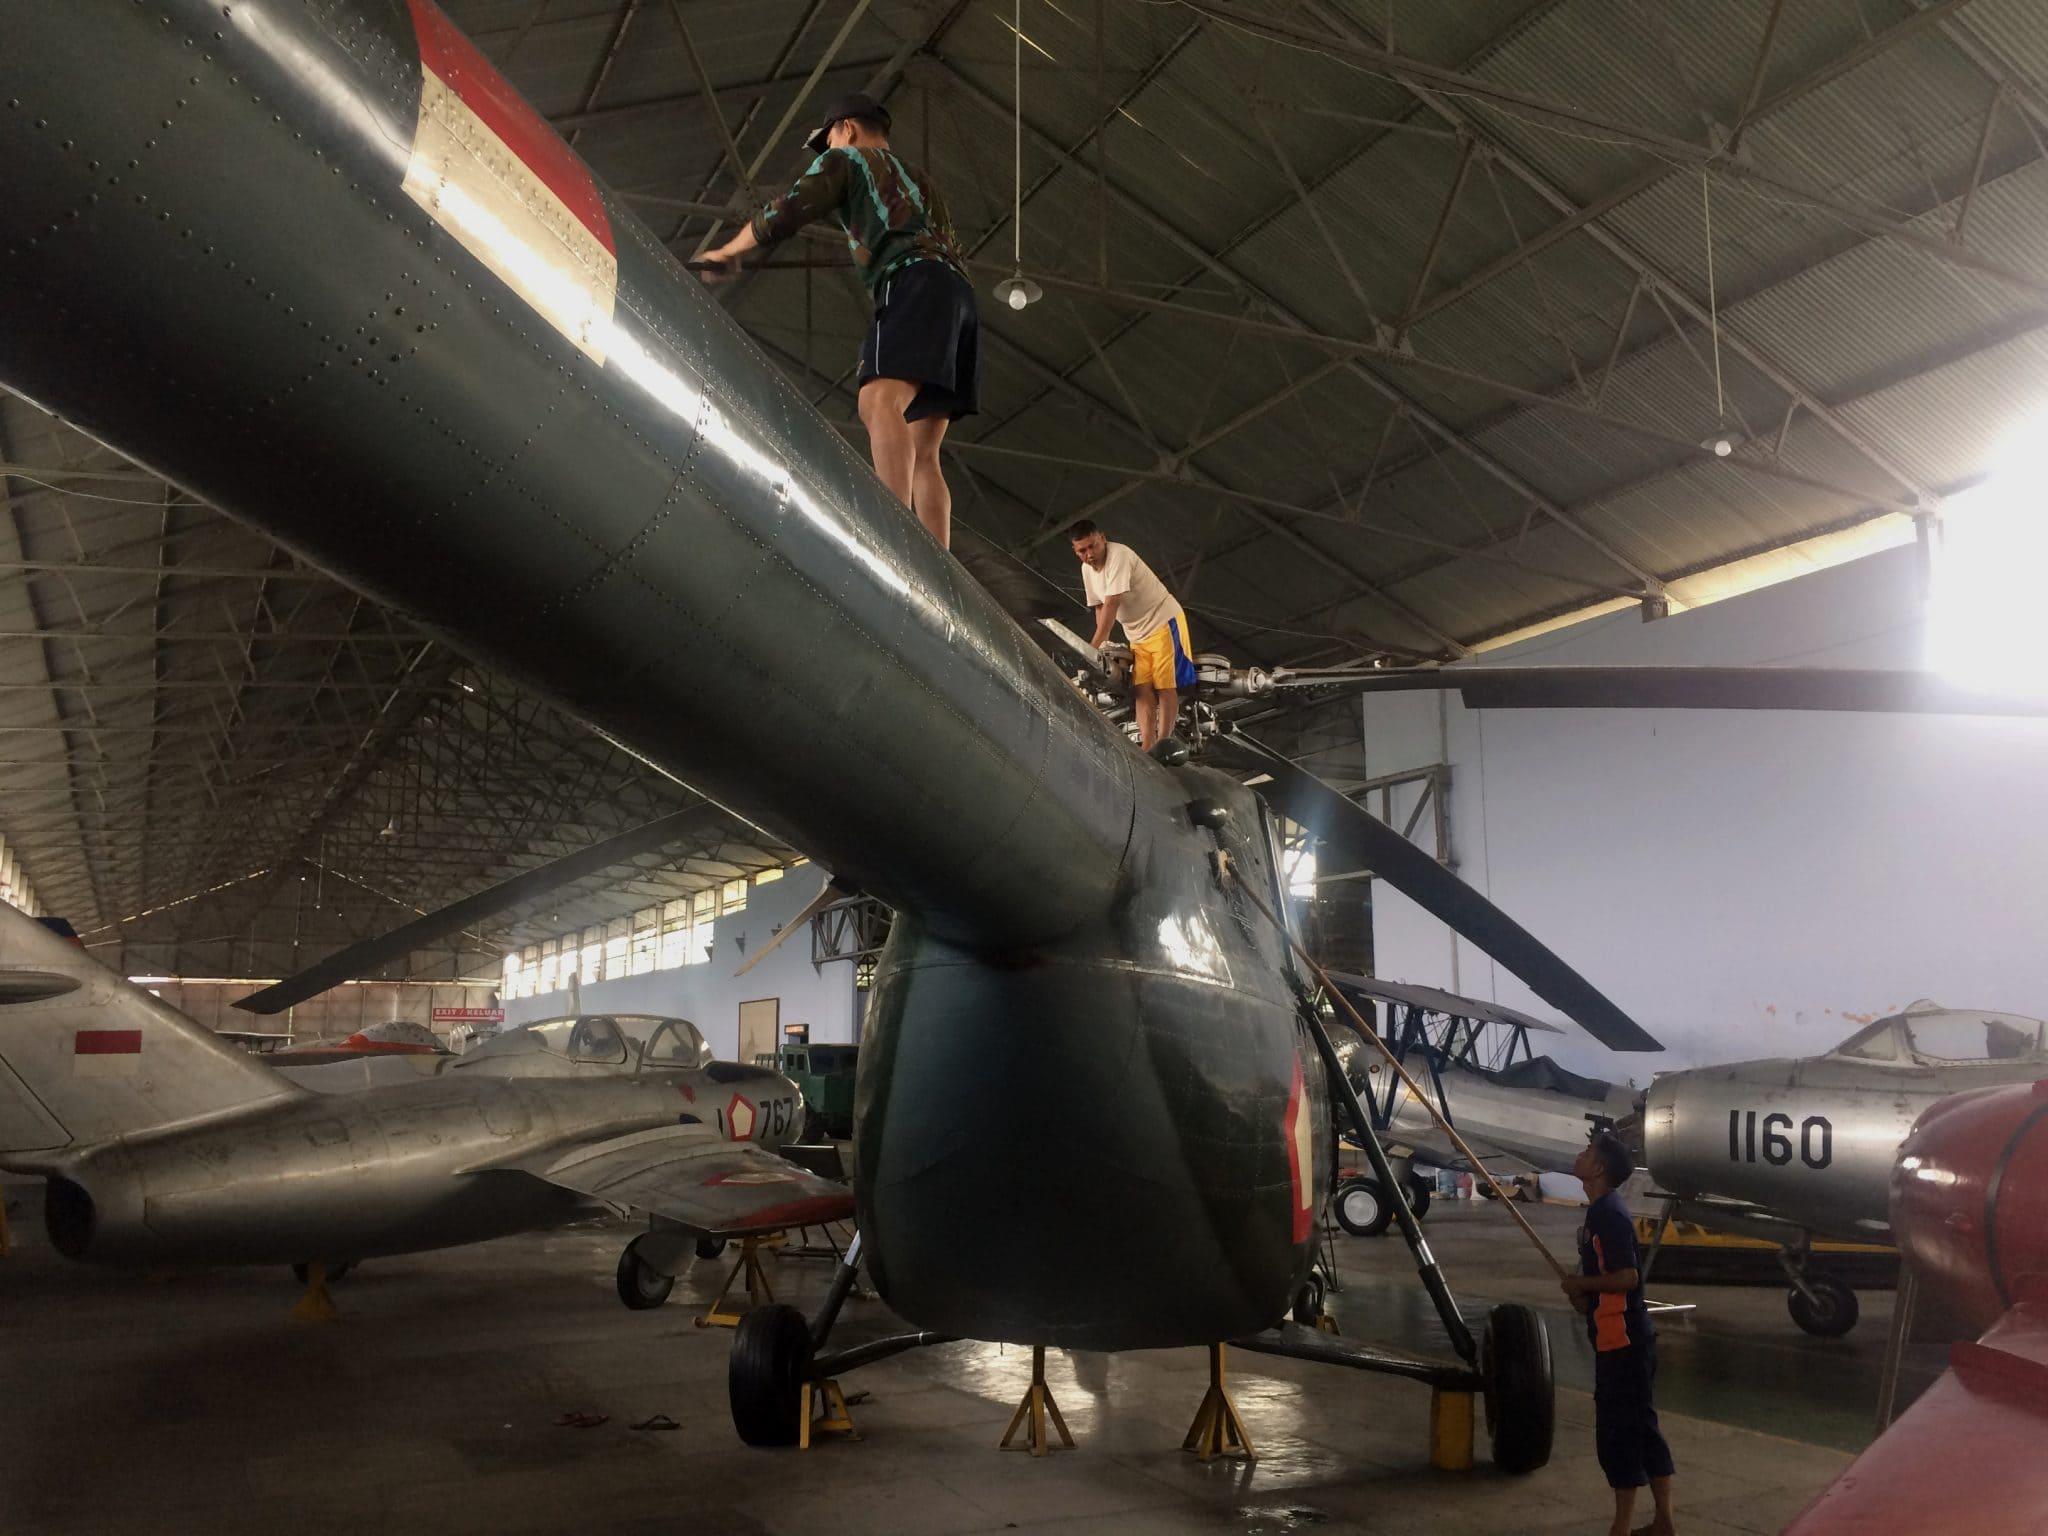 Kegiatan Menyongsong Hari Bhakti Tni Angkatan Udara Ke-70